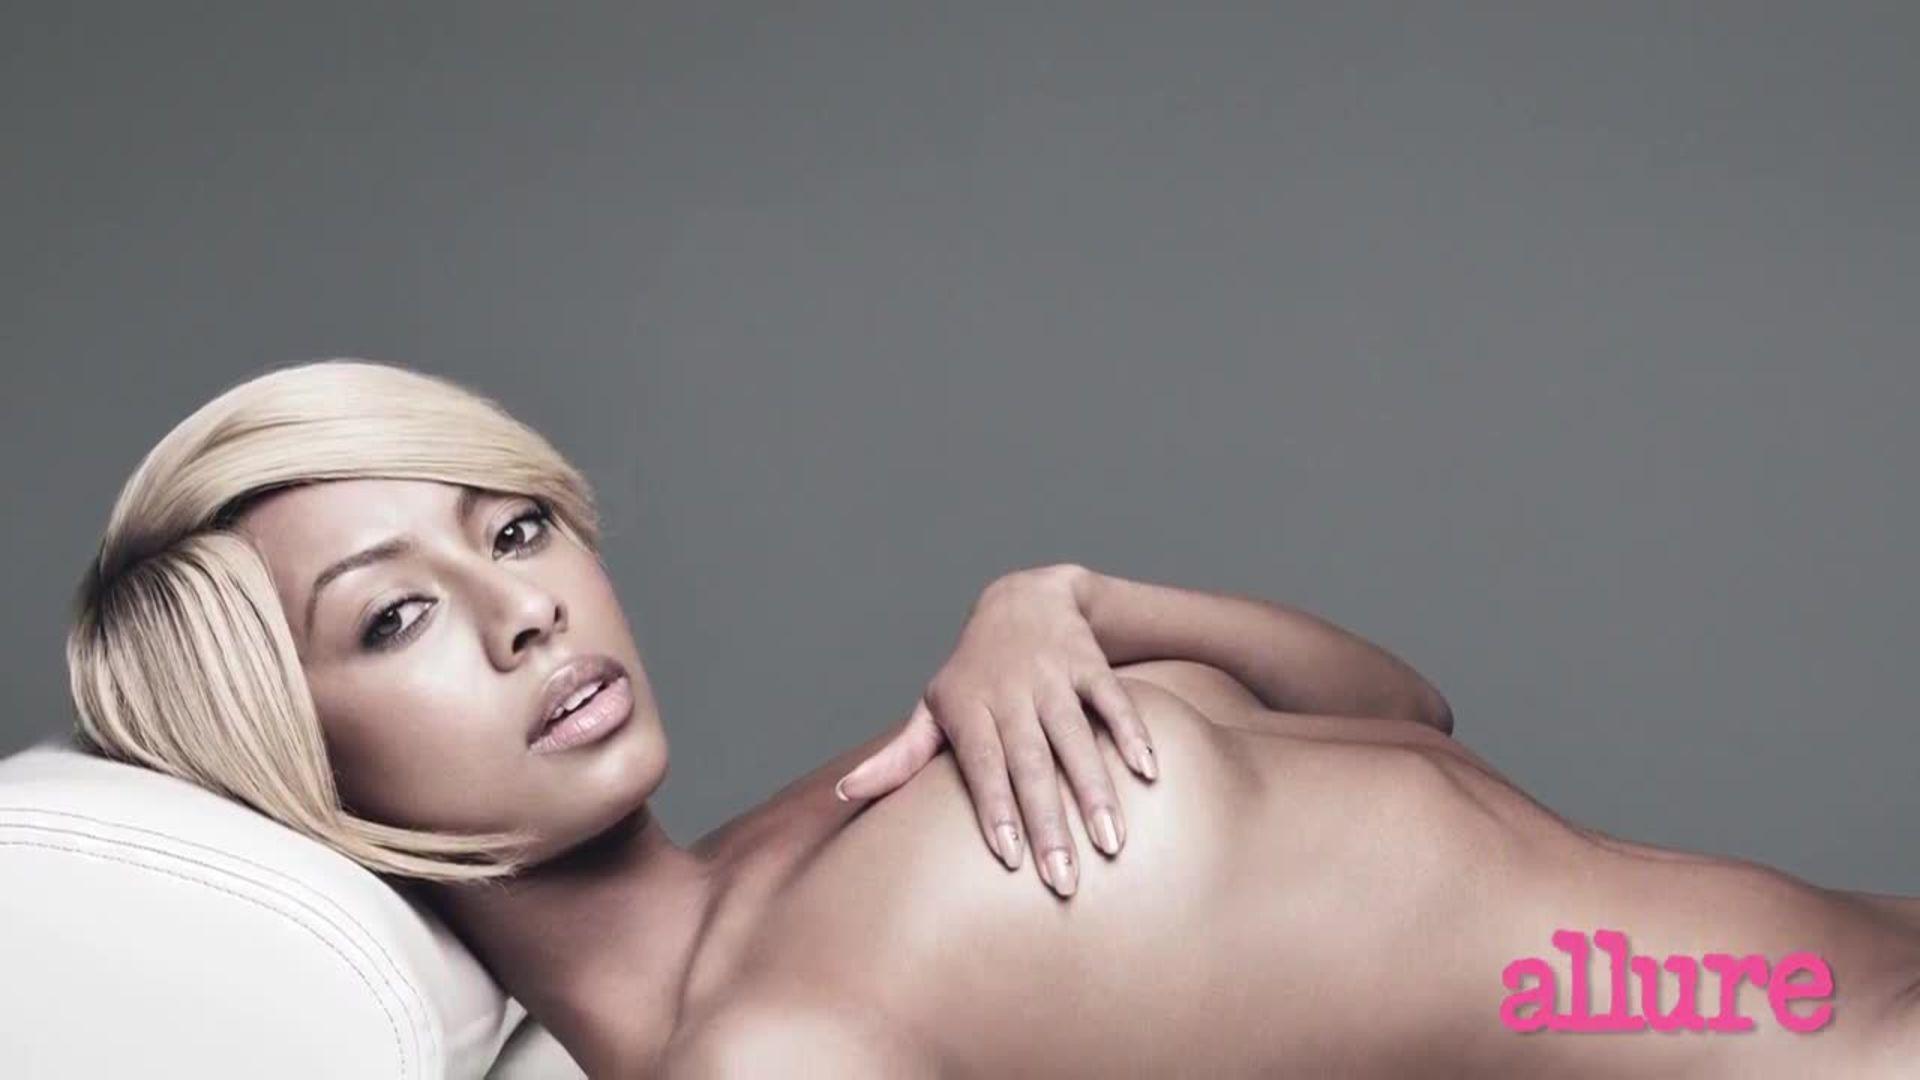 Keri Hilson Topless photo 16